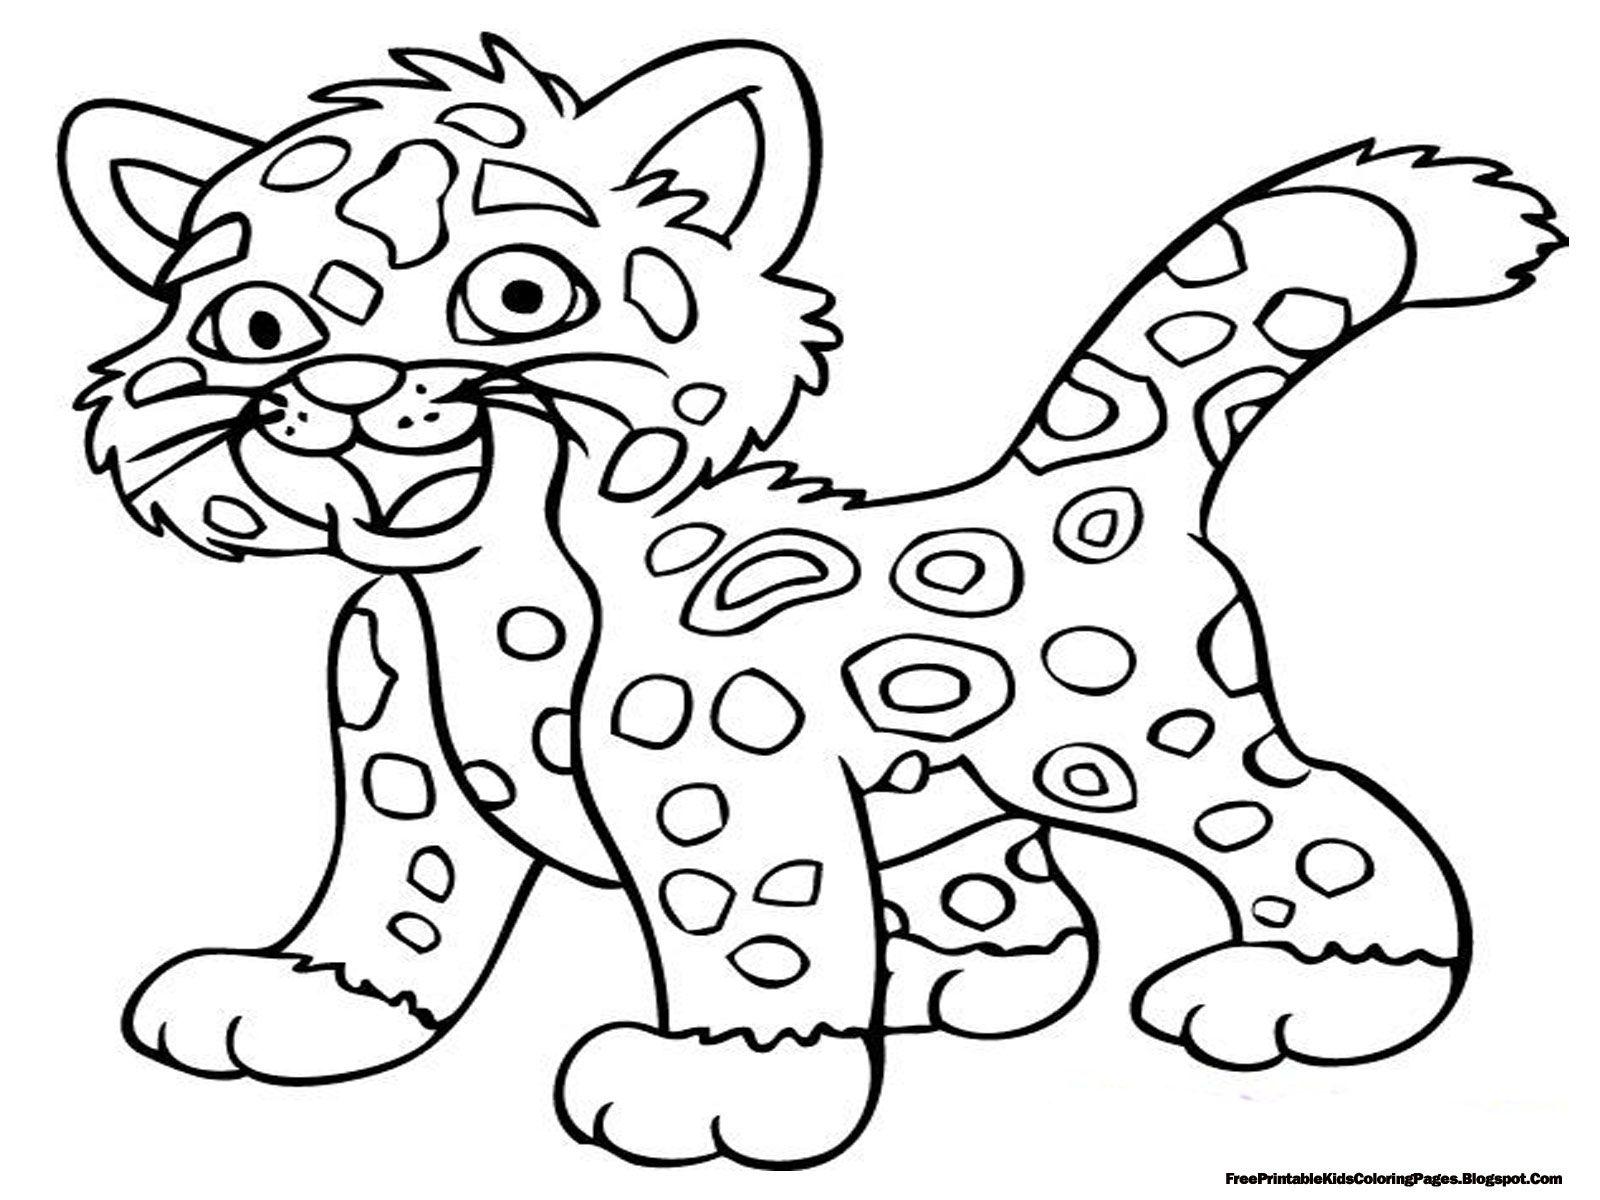 #coloring #jaguar #pages #printable #2020 Check more at ...